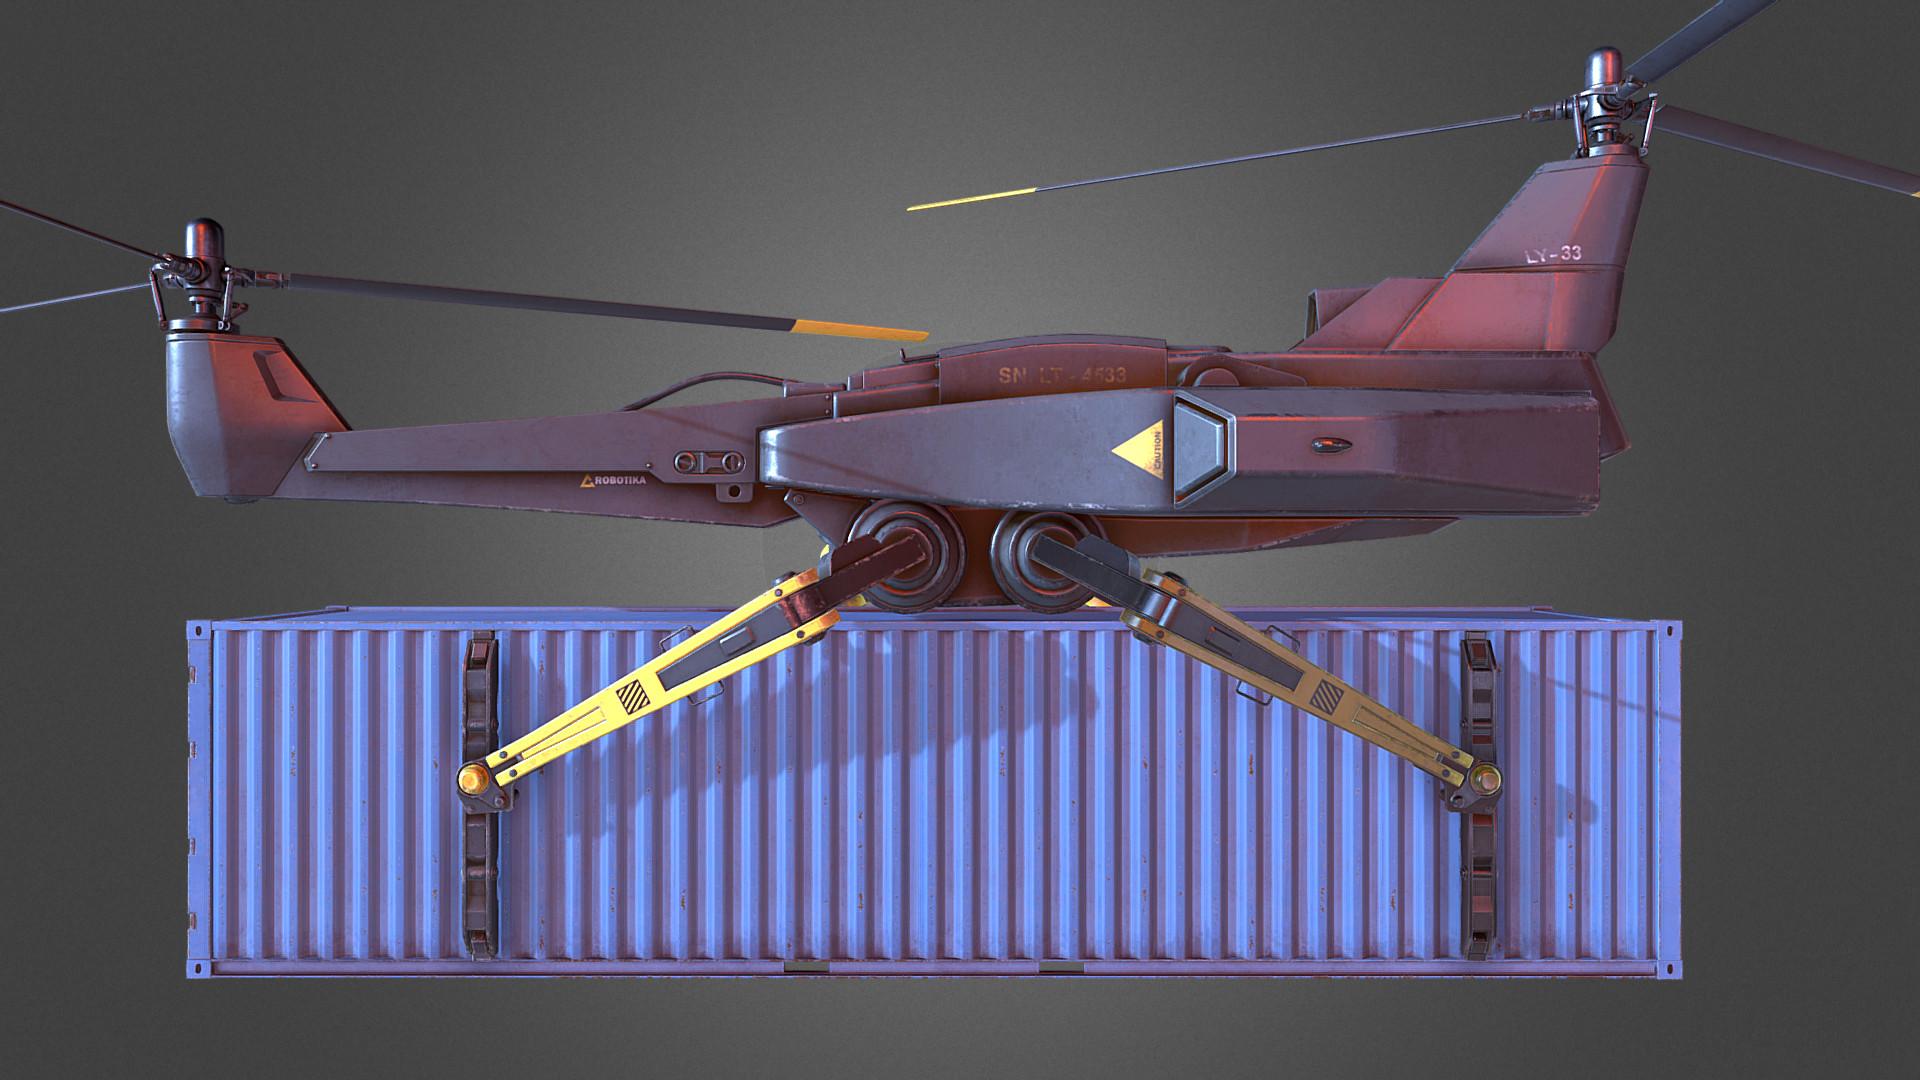 Jonas prunskus cargo drone 03